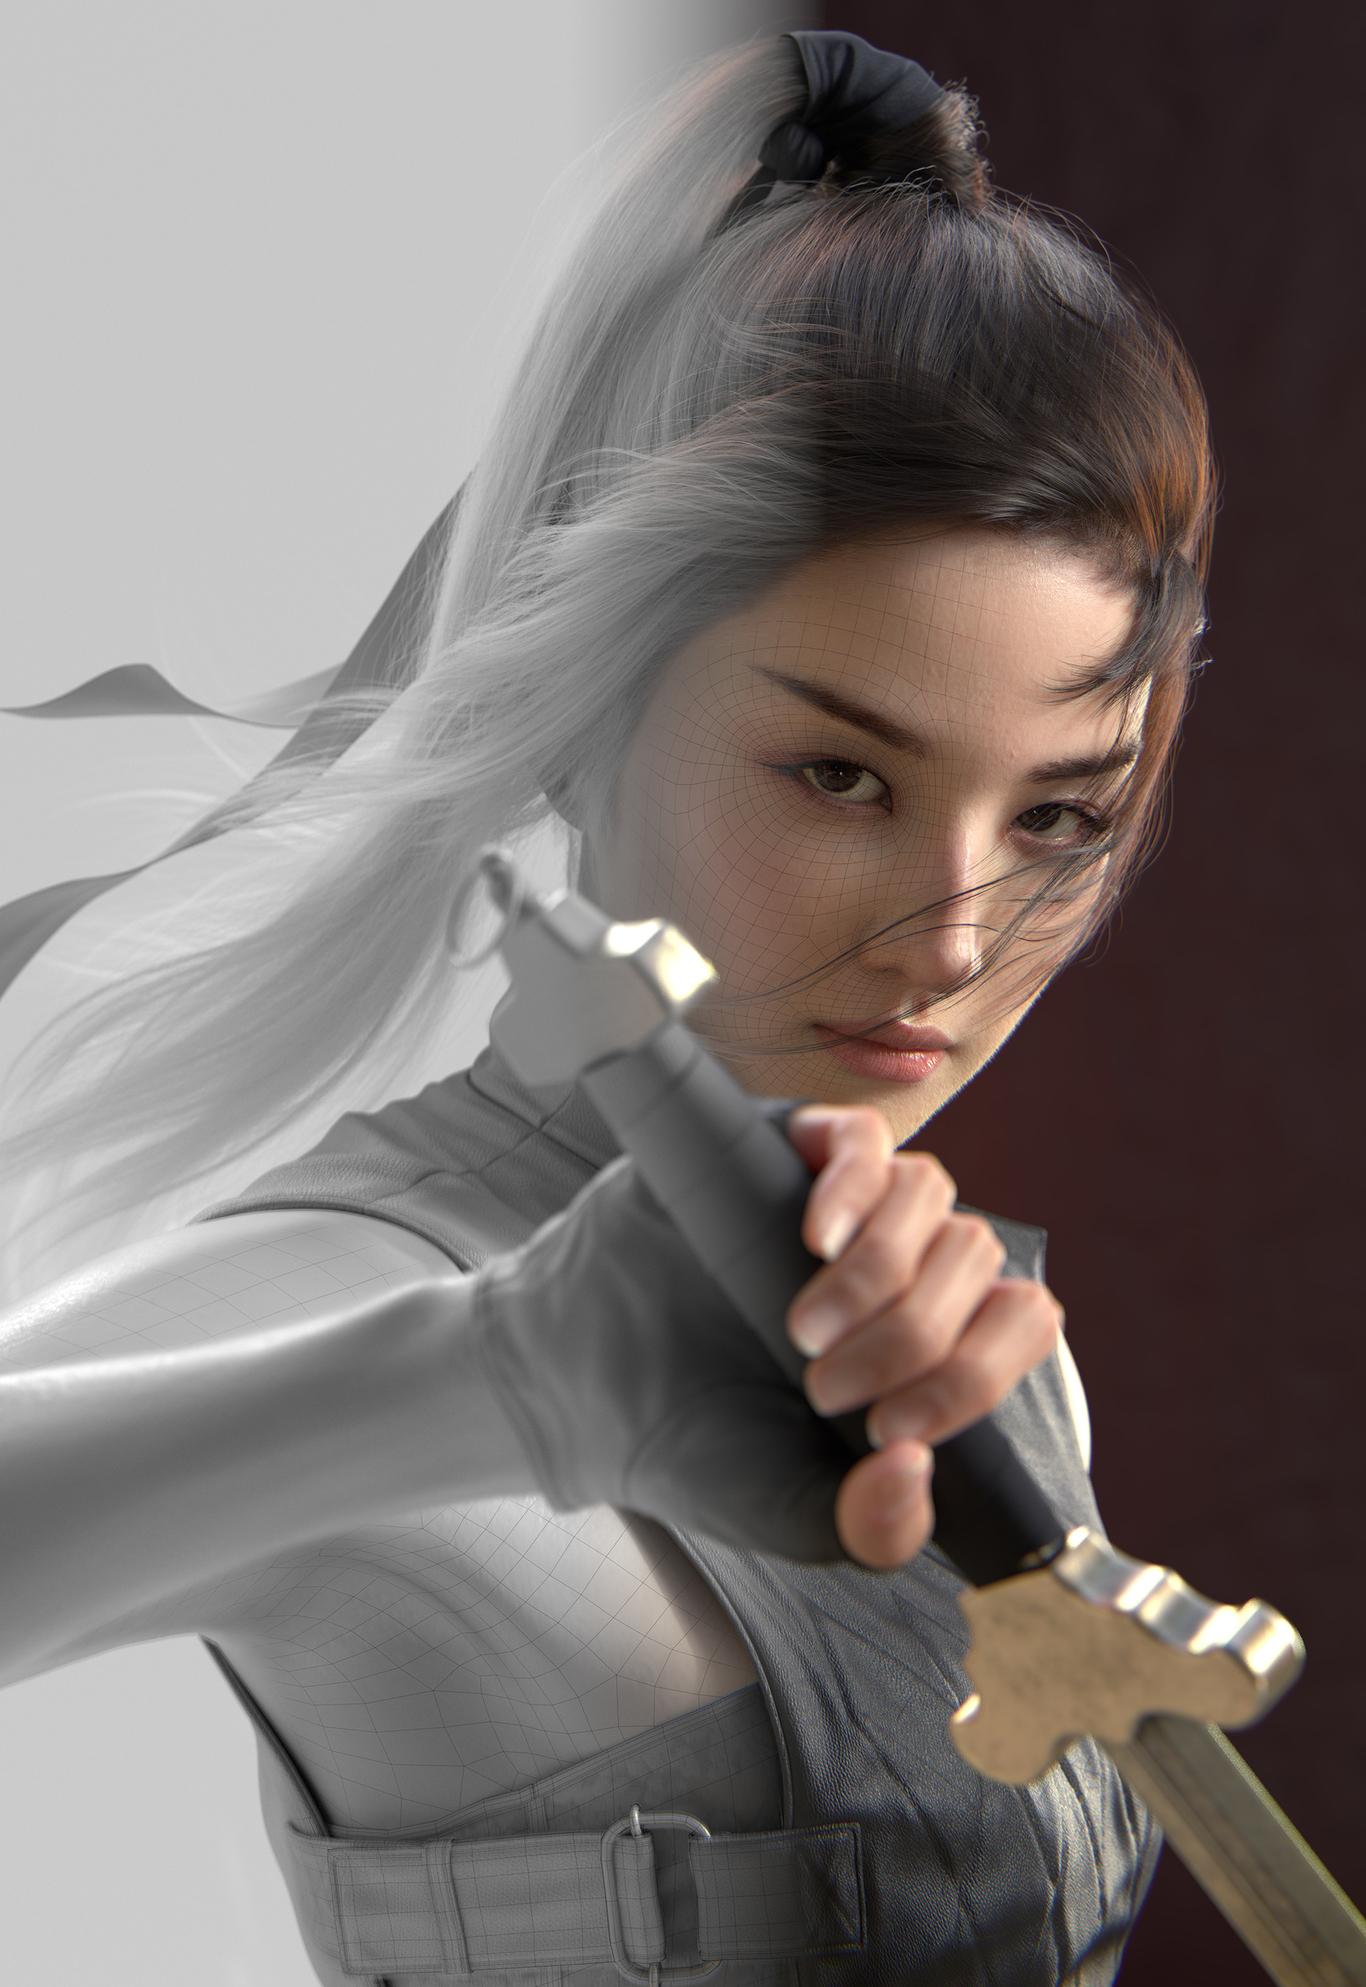 Liu yifei likeness as Mulan, , jwpark - CGSociety